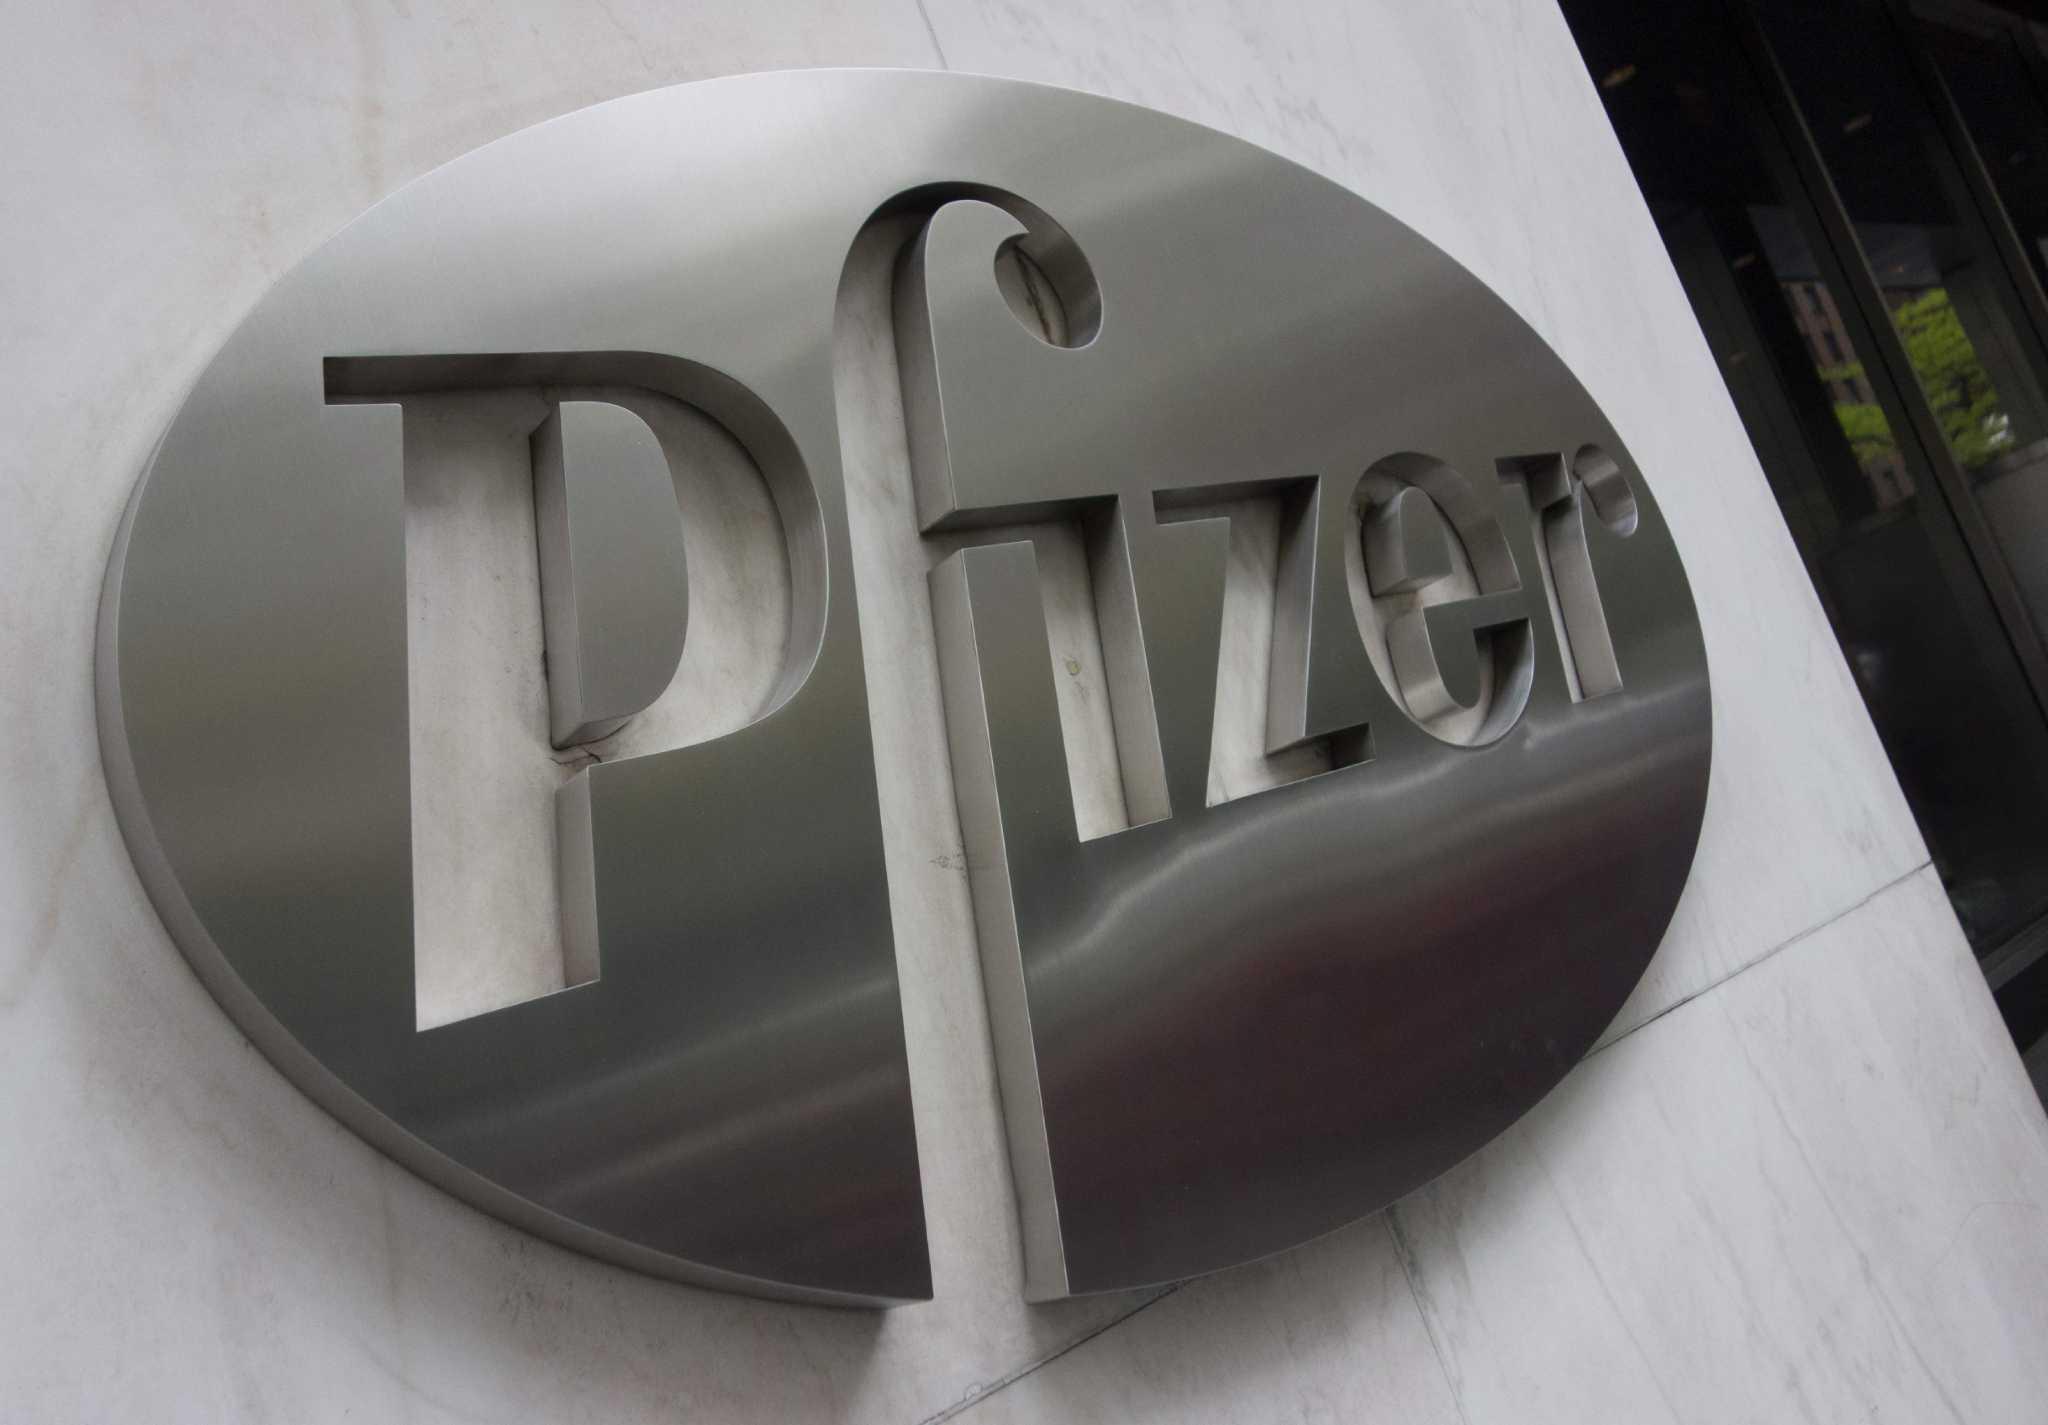 Pfizer scrapping drug amid access concerns - San Antonio Express-News